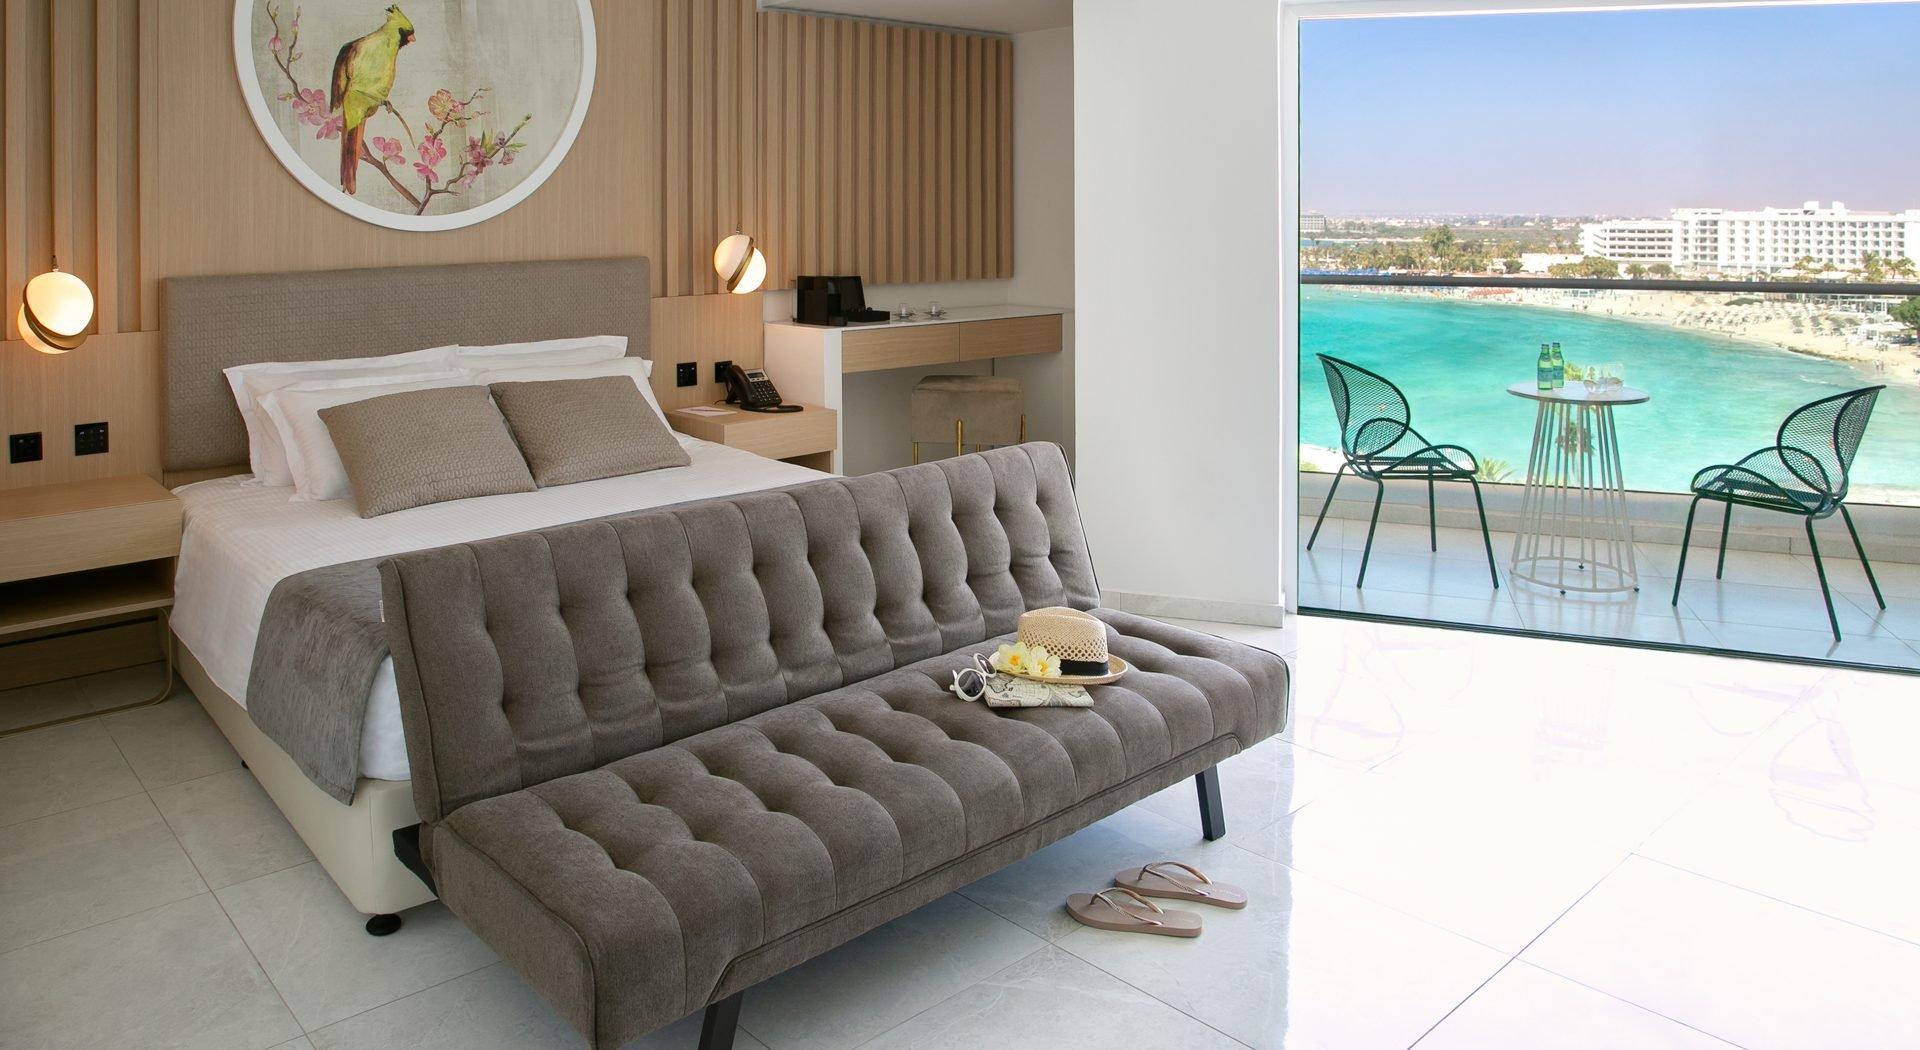 junior suite - Hotel Nissi Blu - Ayia Napa